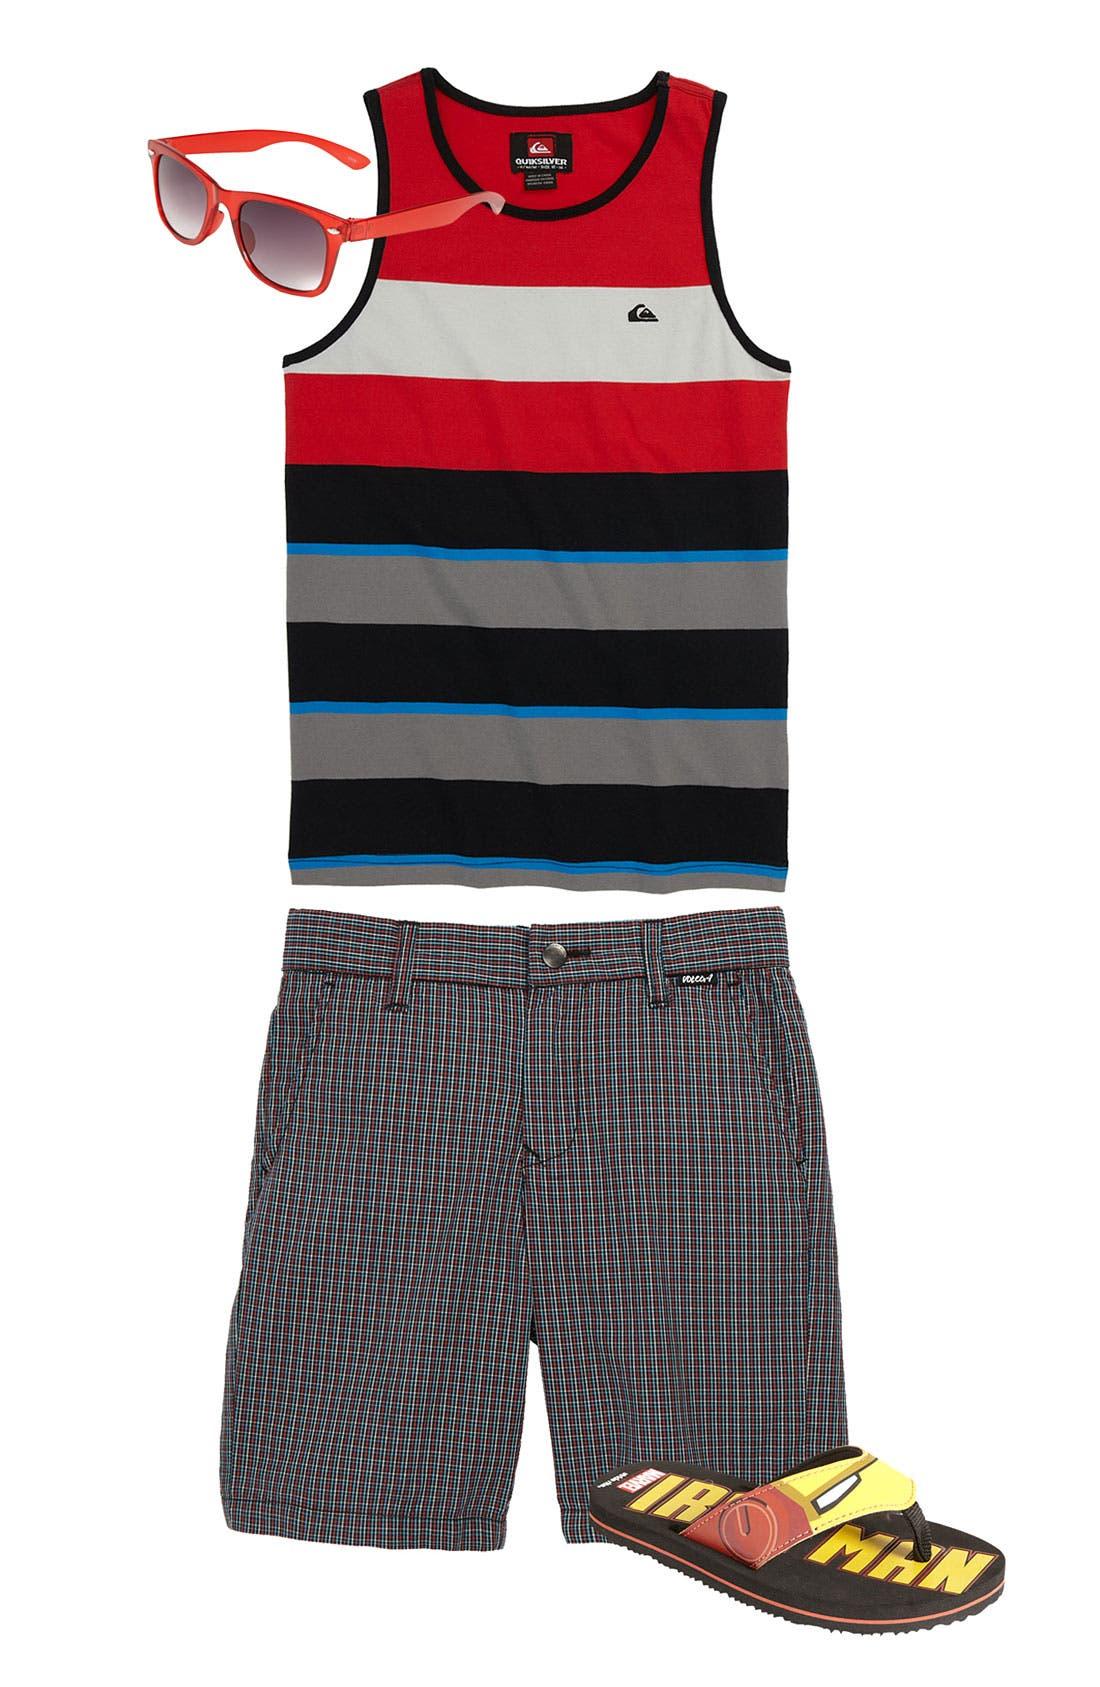 Alternate Image 1 Selected - Quiksilver Shirt, Volcom Shorts, Icon Eyewear Sunglasses (Little Boys)